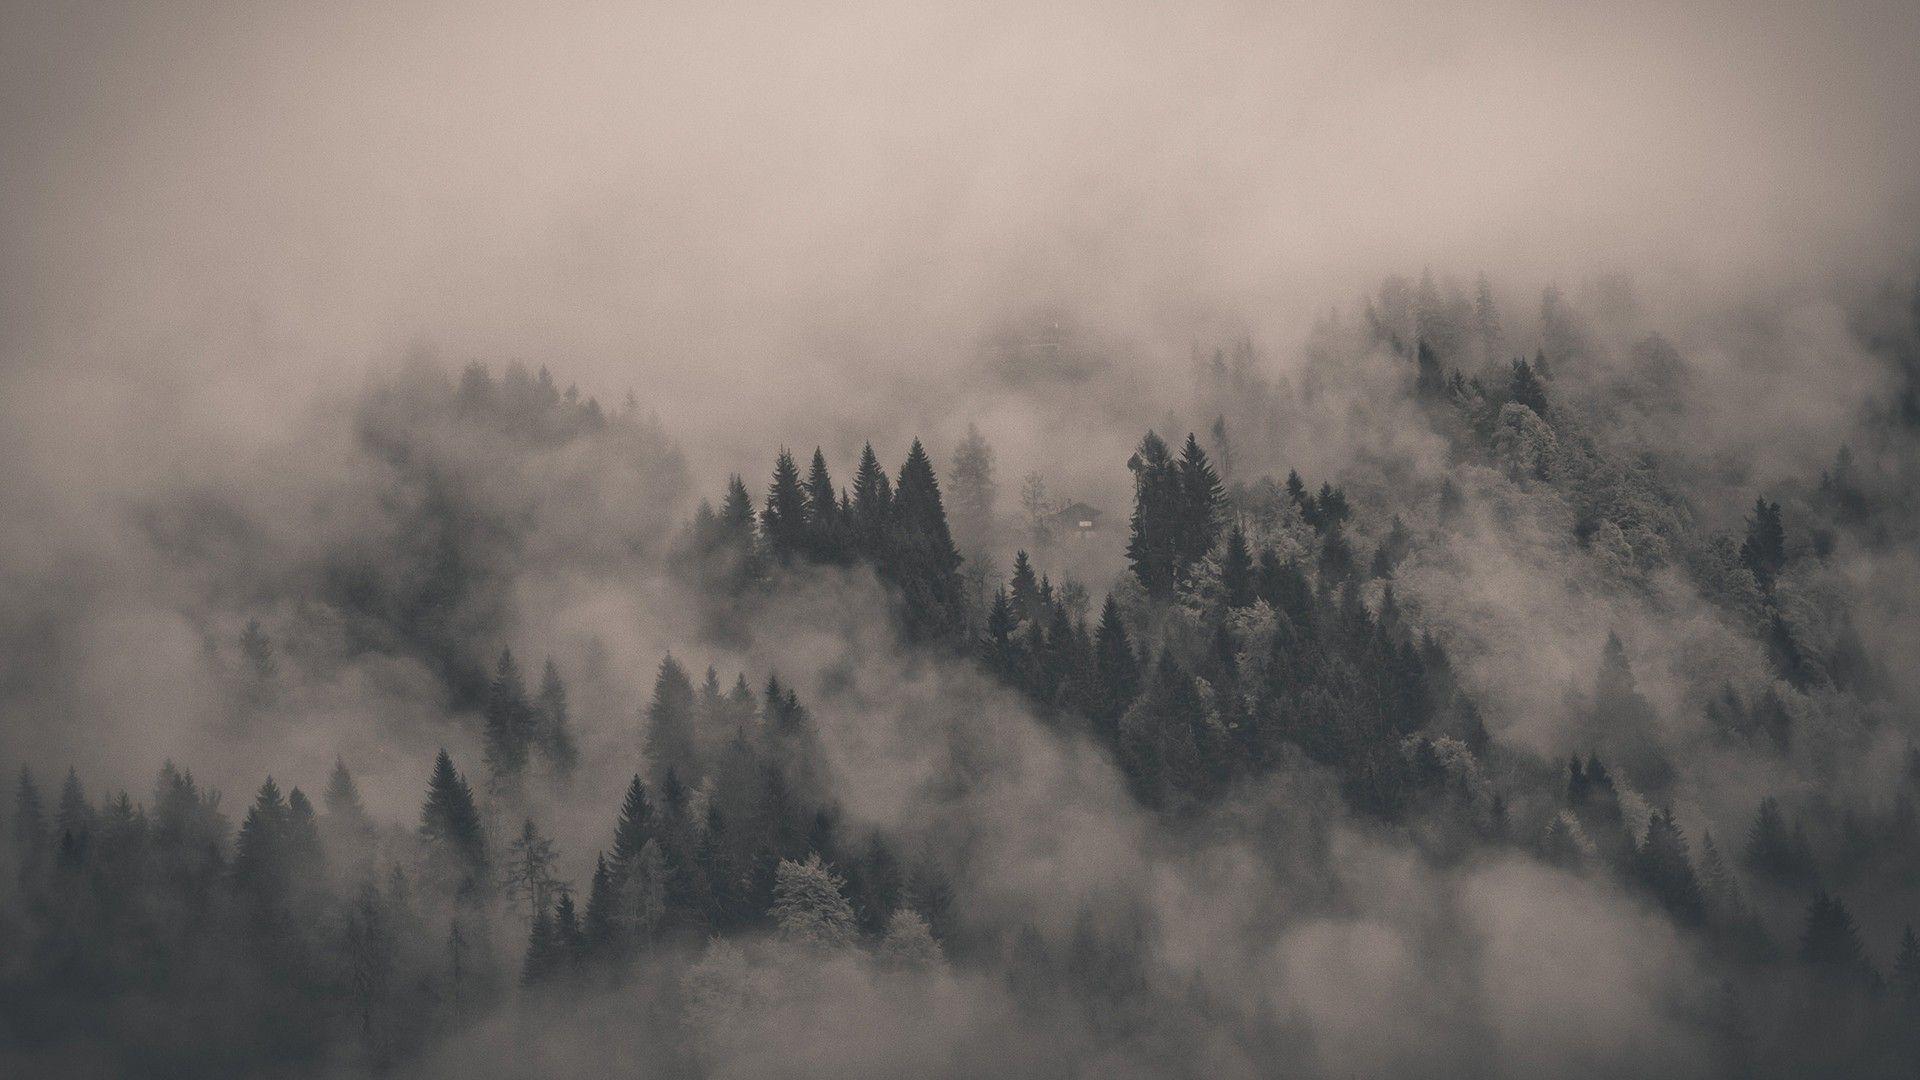 Creepy Landscapes Nature Trees Fog Mist Atmospheric Forest Wallpaper 2935650 Wallbase Cc Landscape Wallpaper Dark Landscape Dark Wallpaper